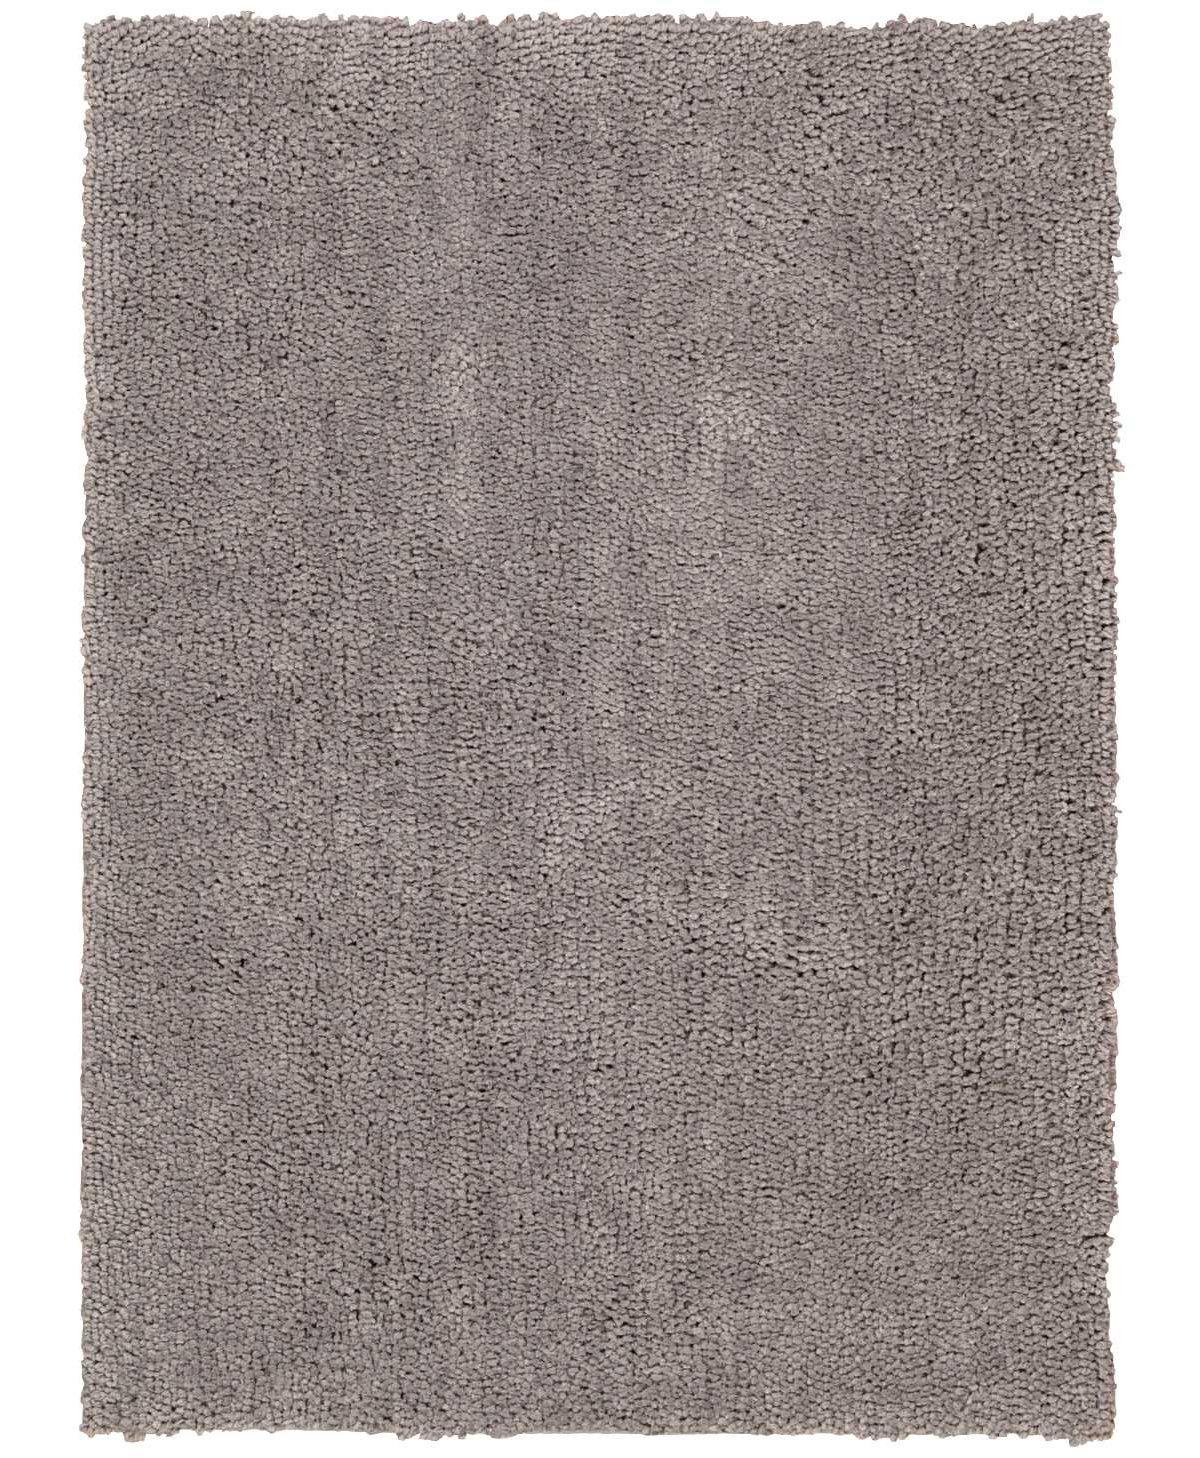 Puli Gray Poly 5x7 Area Rug